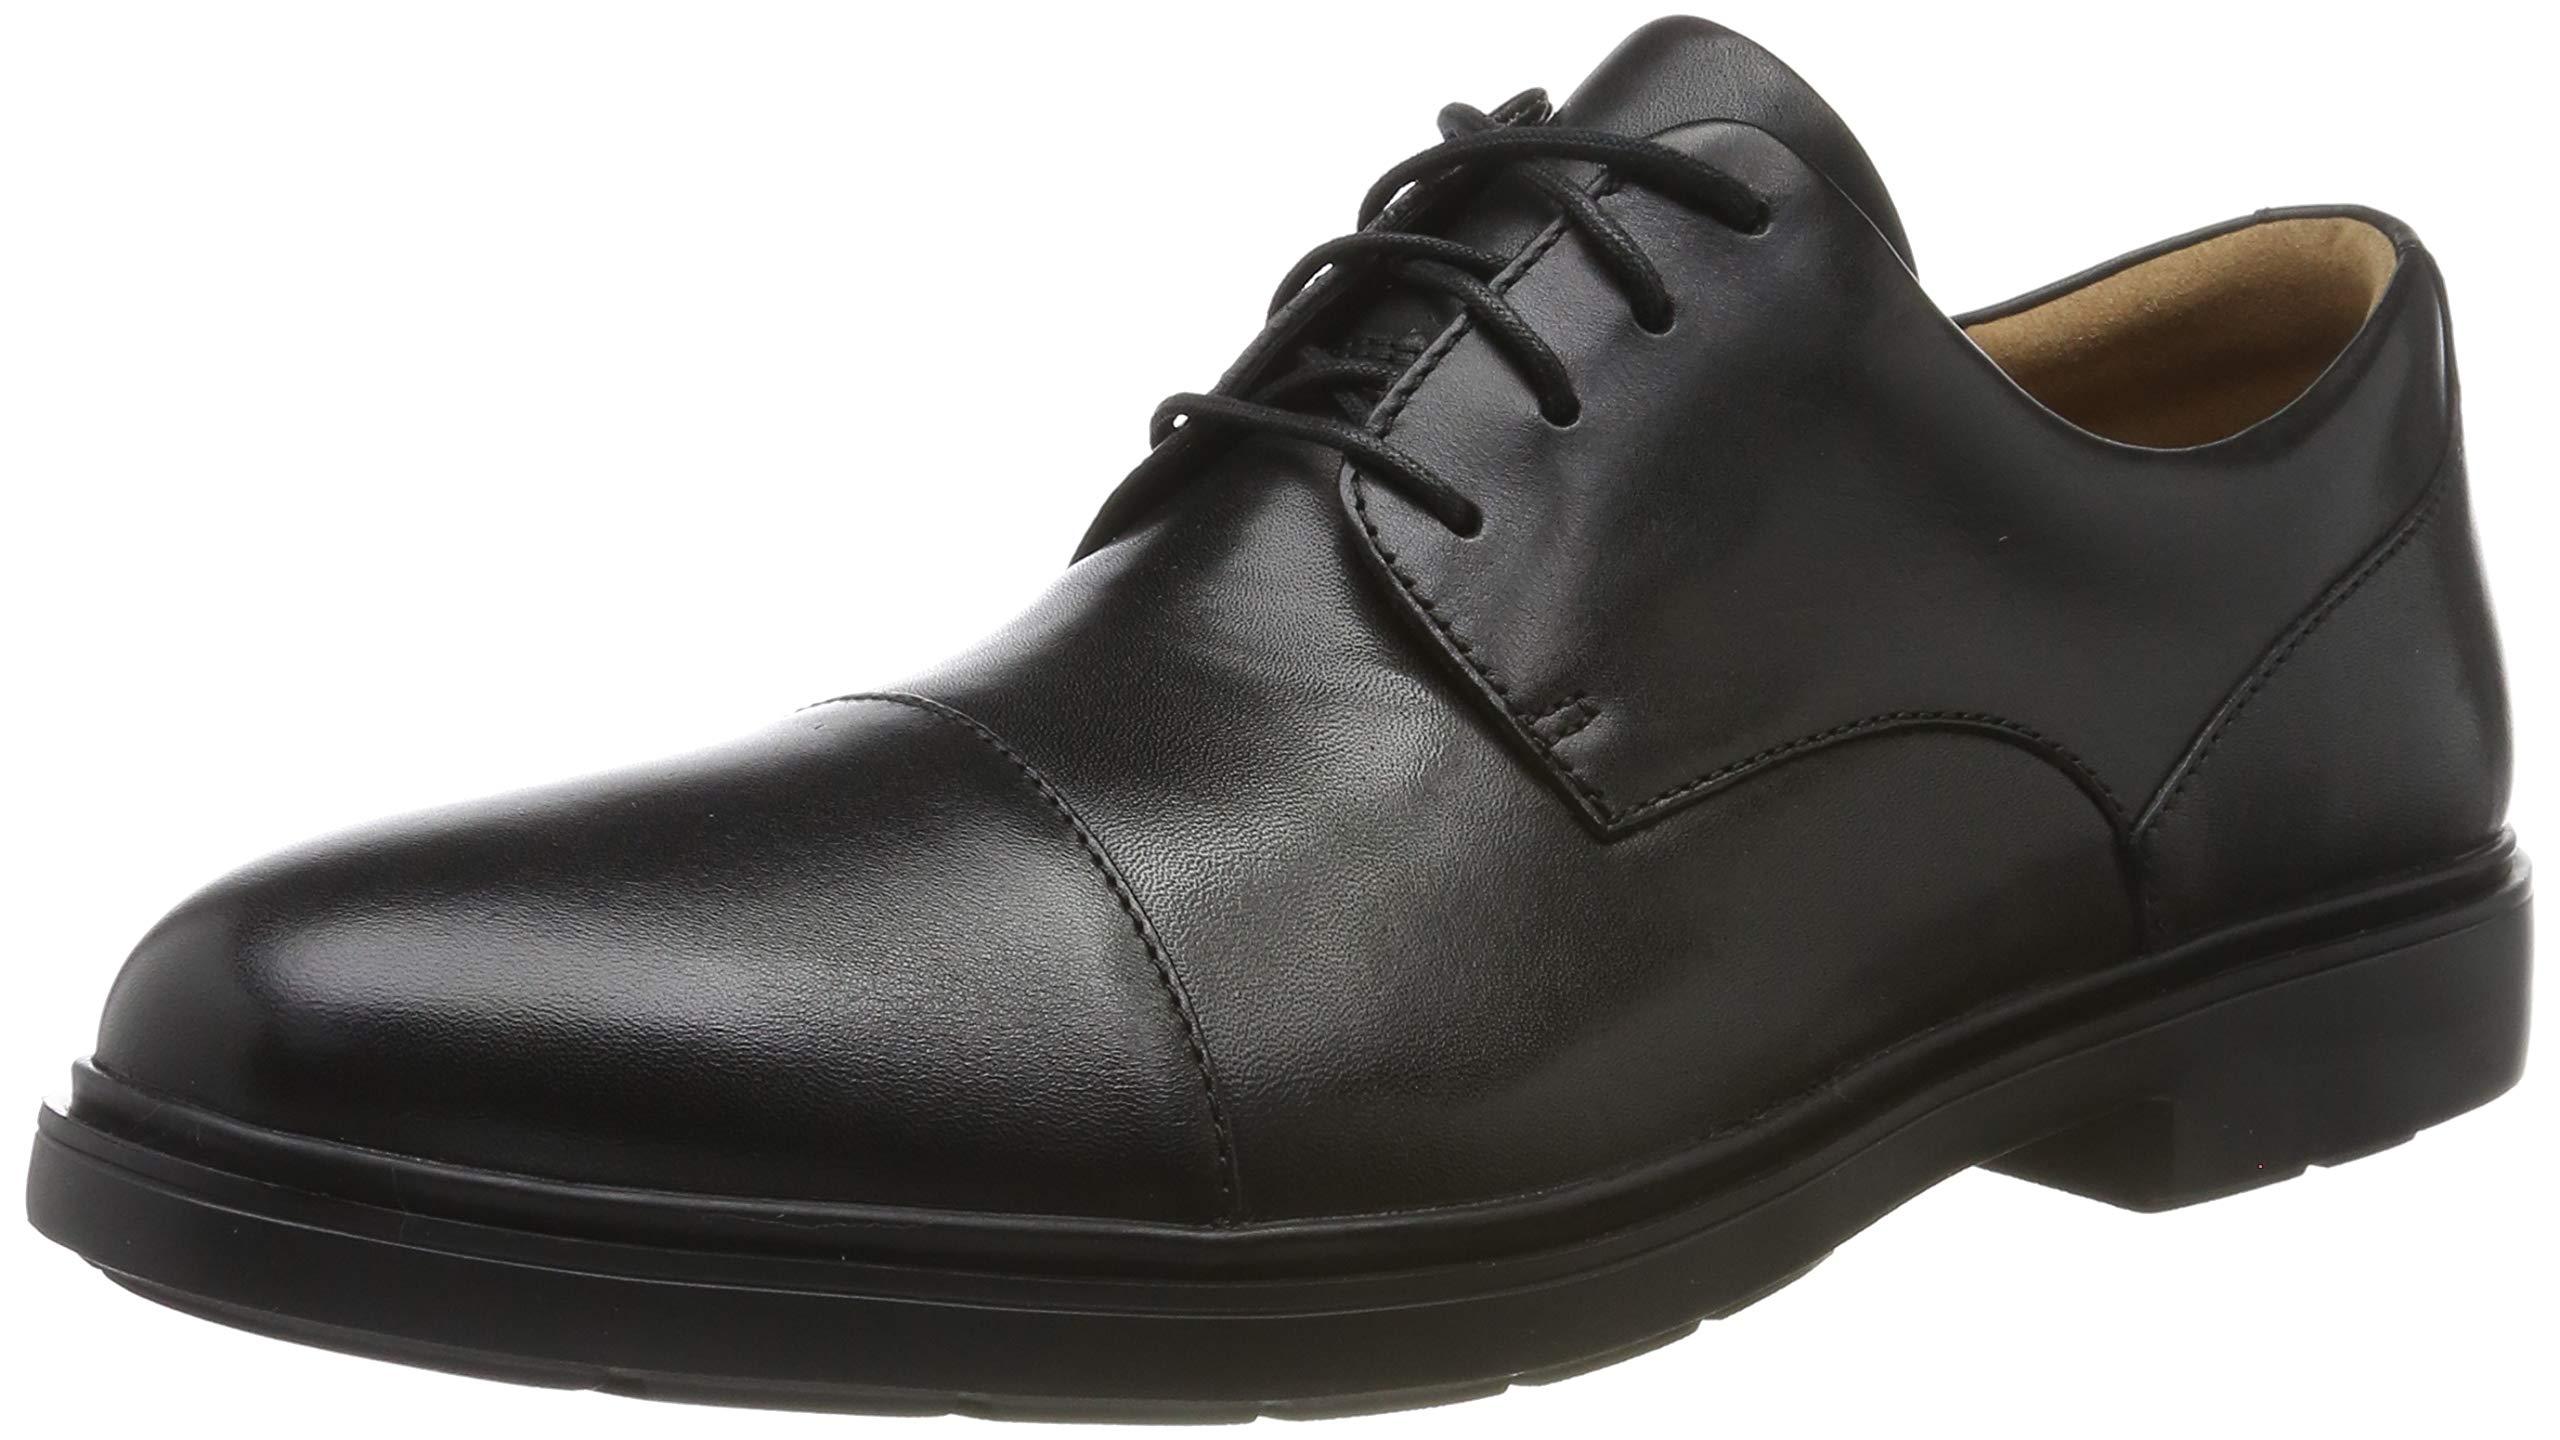 Tailor Clarks 5 CapDerbys Un HommeNoir Leather44 Eu Black TF13luJcK